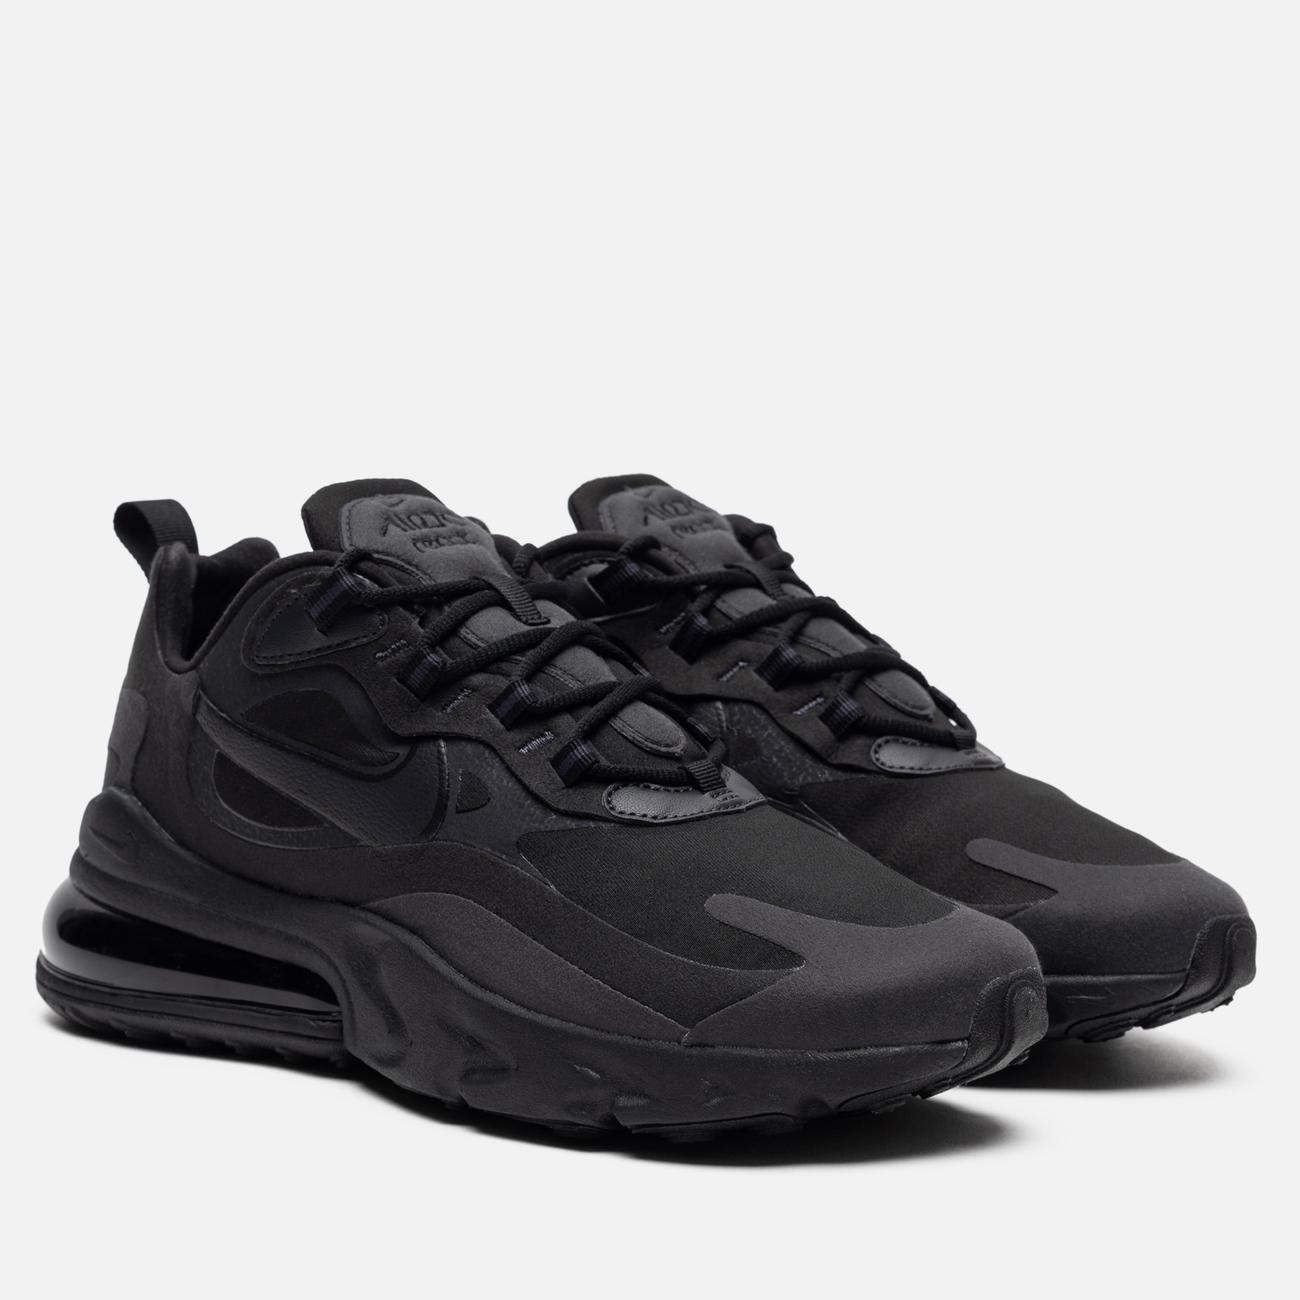 Мужские кроссовки Nike Air Max 270 React Black/Oil Grey/Oil Grey/Black